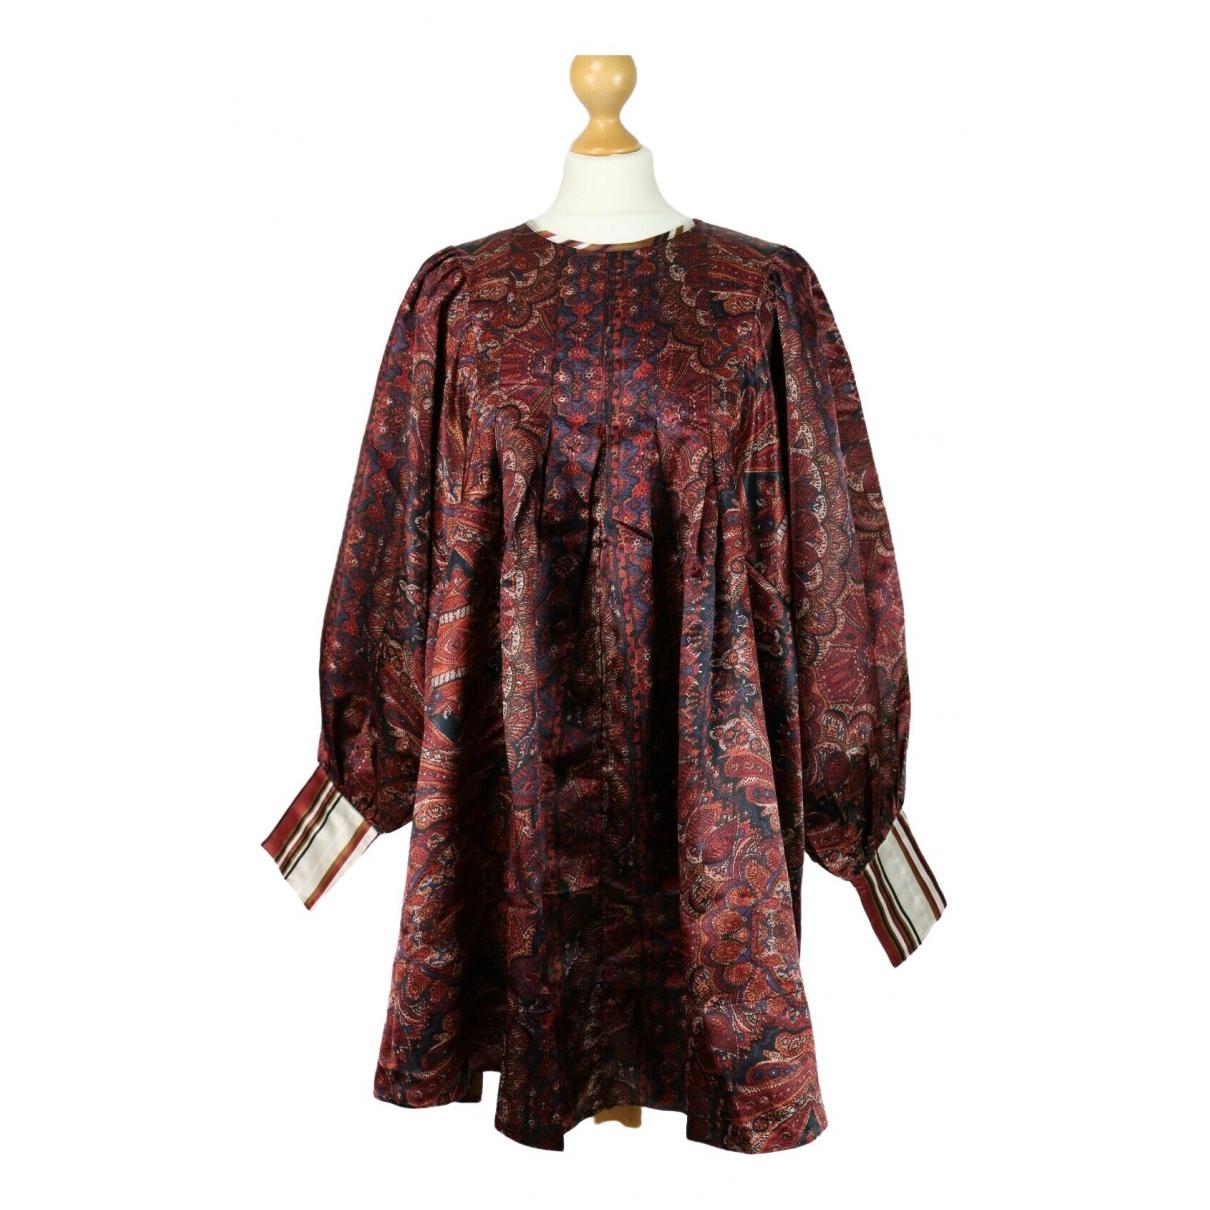 By Timo \N Burgundy dress for Women XS International